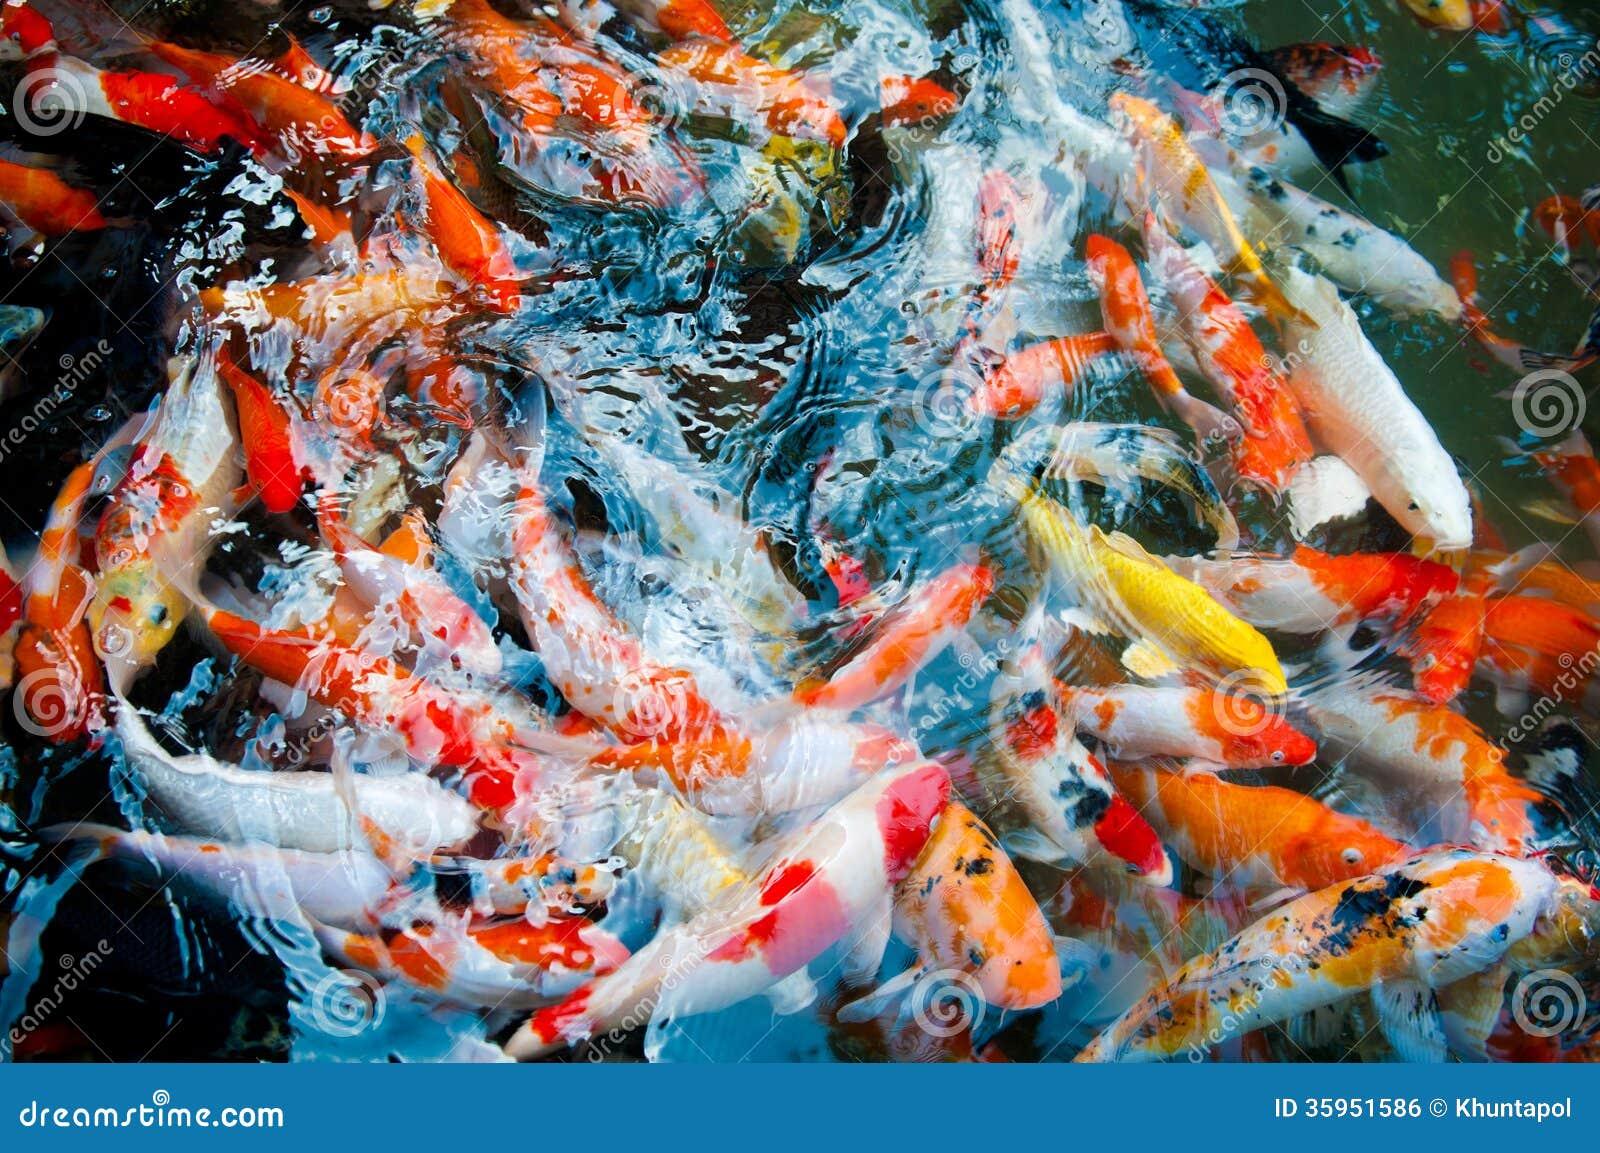 Koi Fish Farming Business Guide